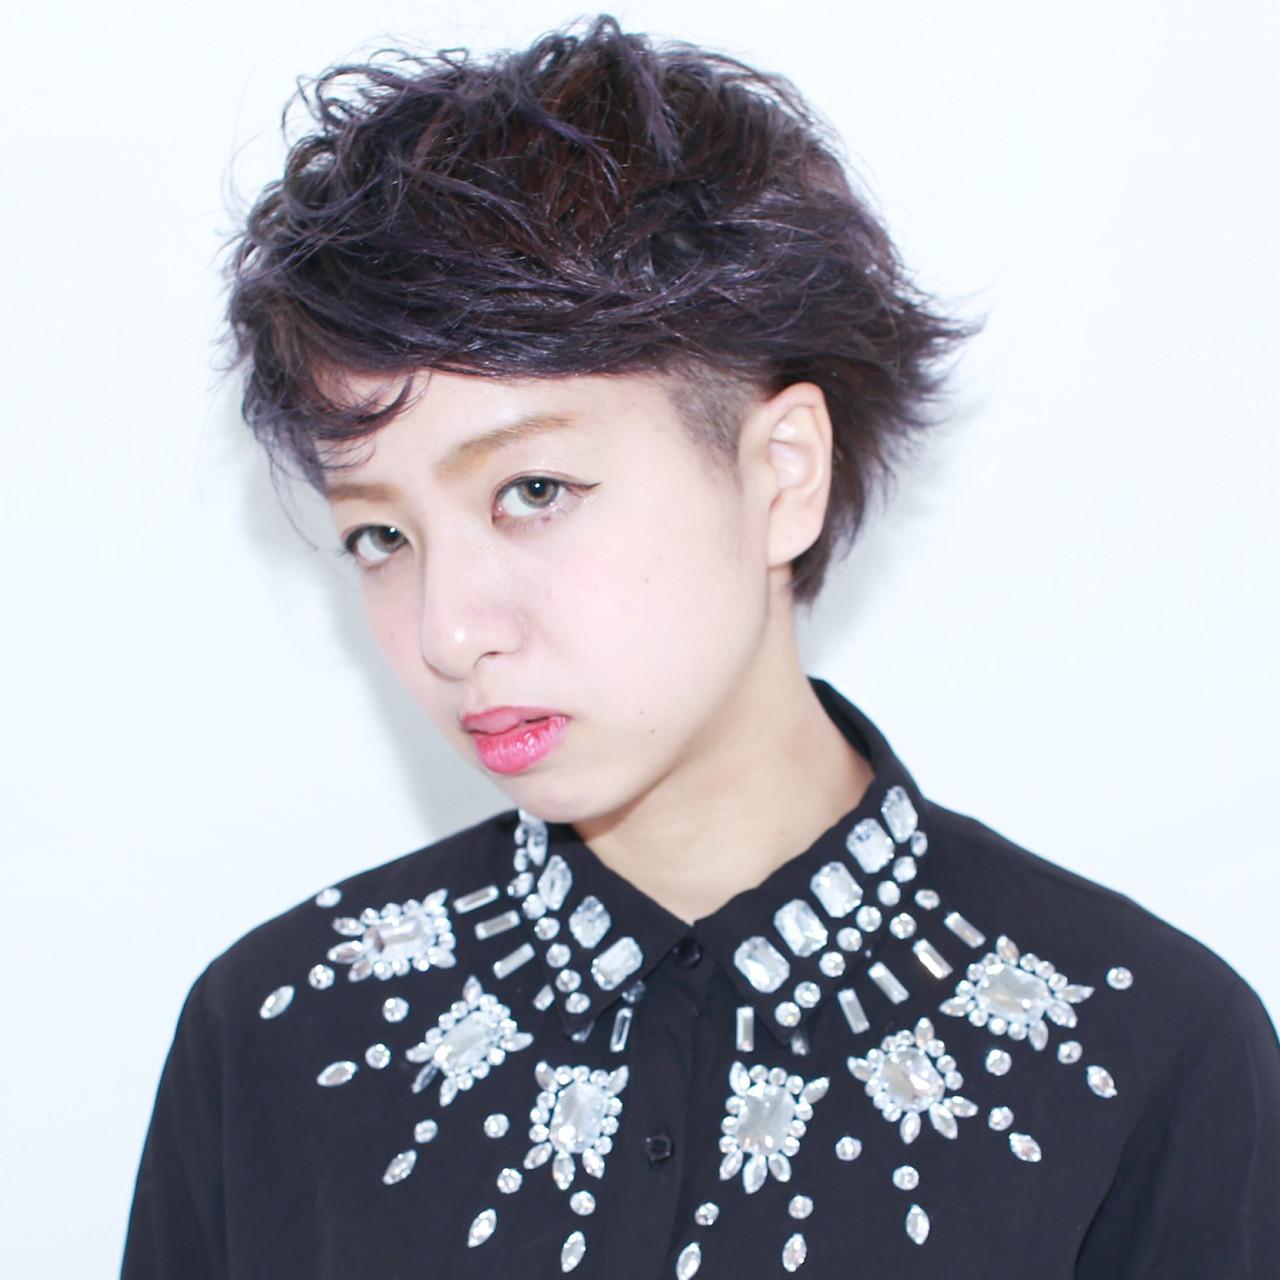 Hair s 201611 160